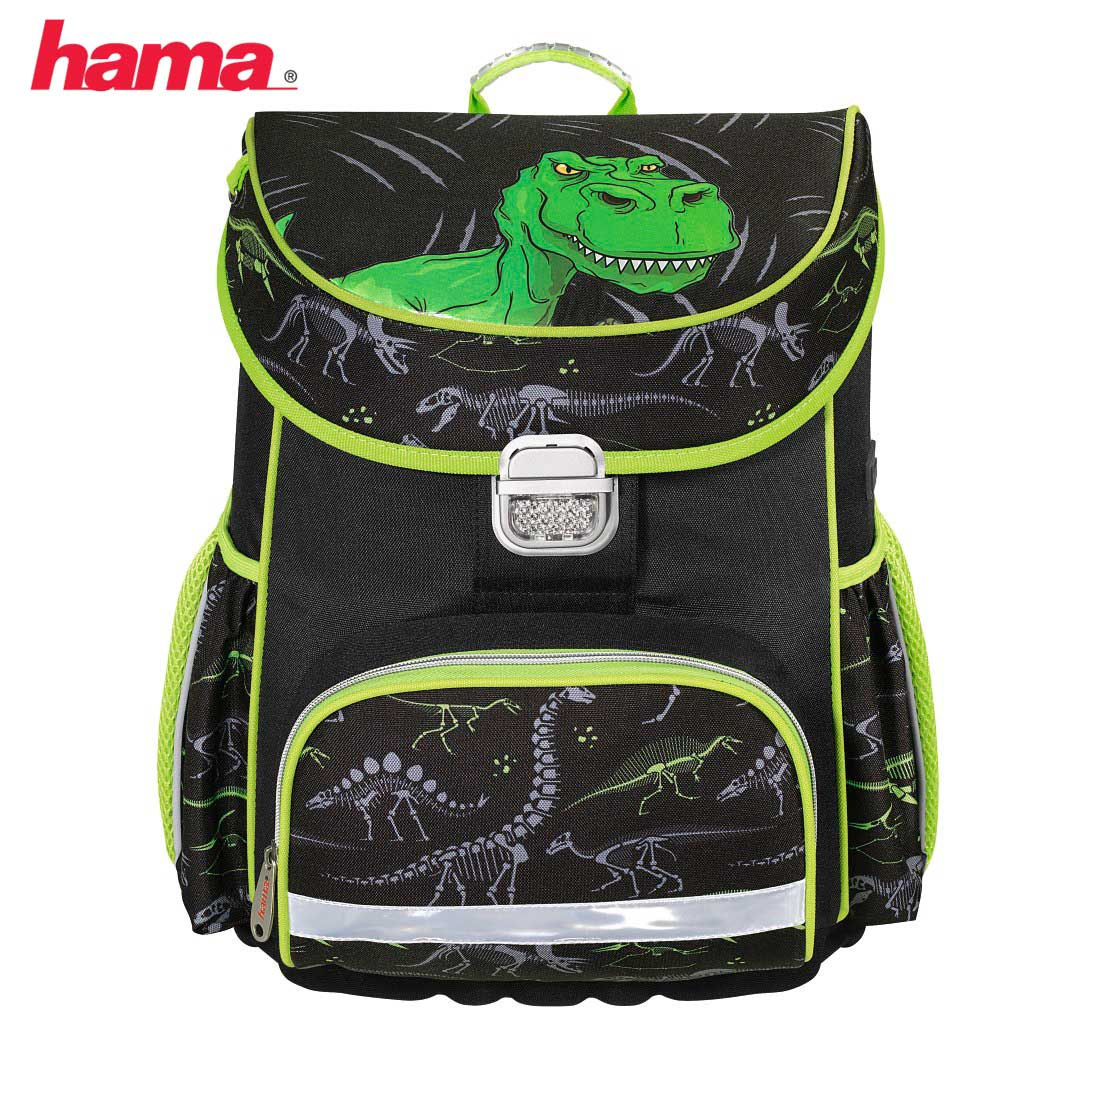 64bda88063 Školská taška HAMA Dino predaj Hamaeshop.sk